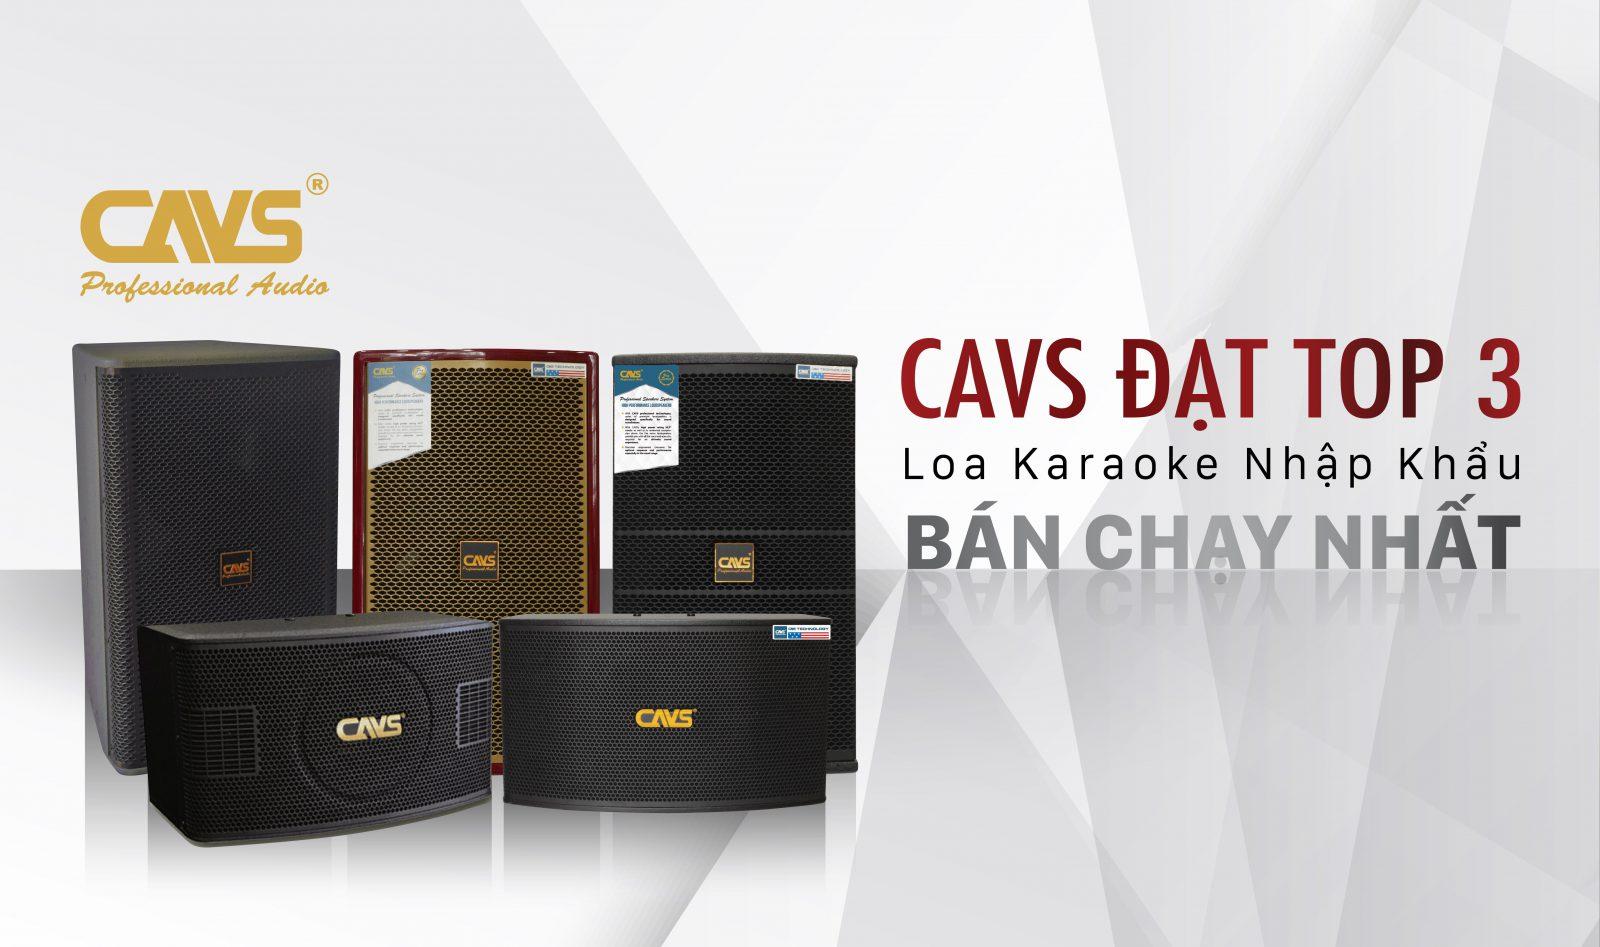 loa-karaoke-ban-chay-nhat